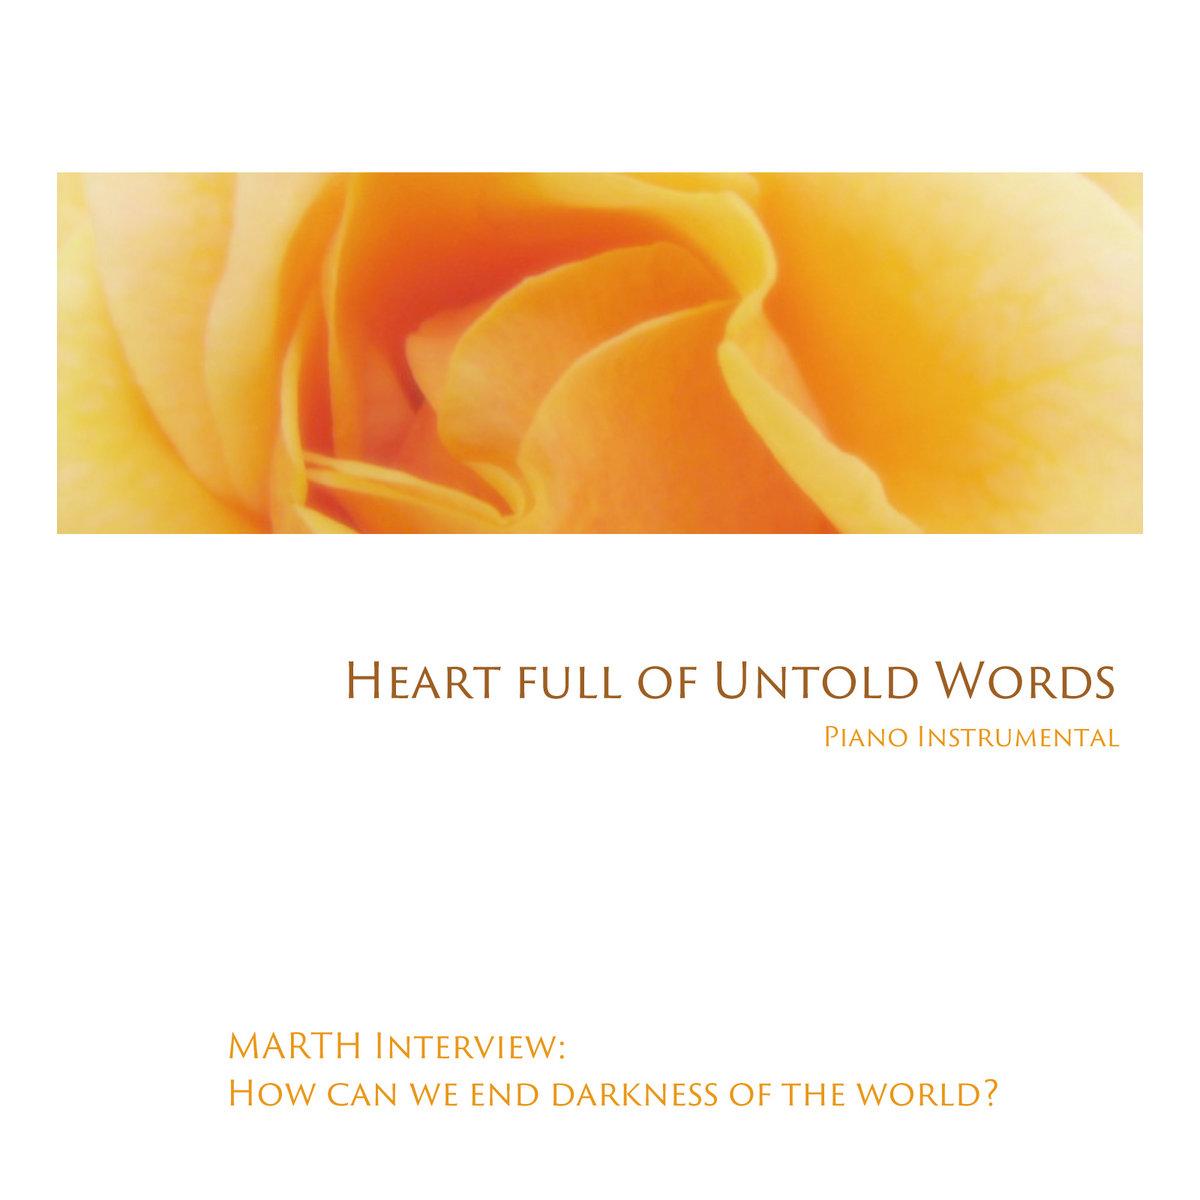 Heart full of Untold Words (Piano Instrumental) | MARTH